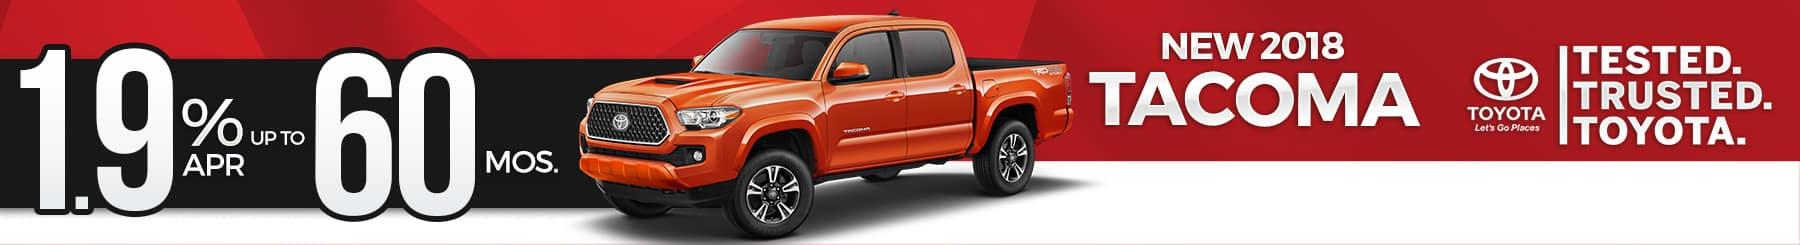 Toyota-Tacoma Finance-Special